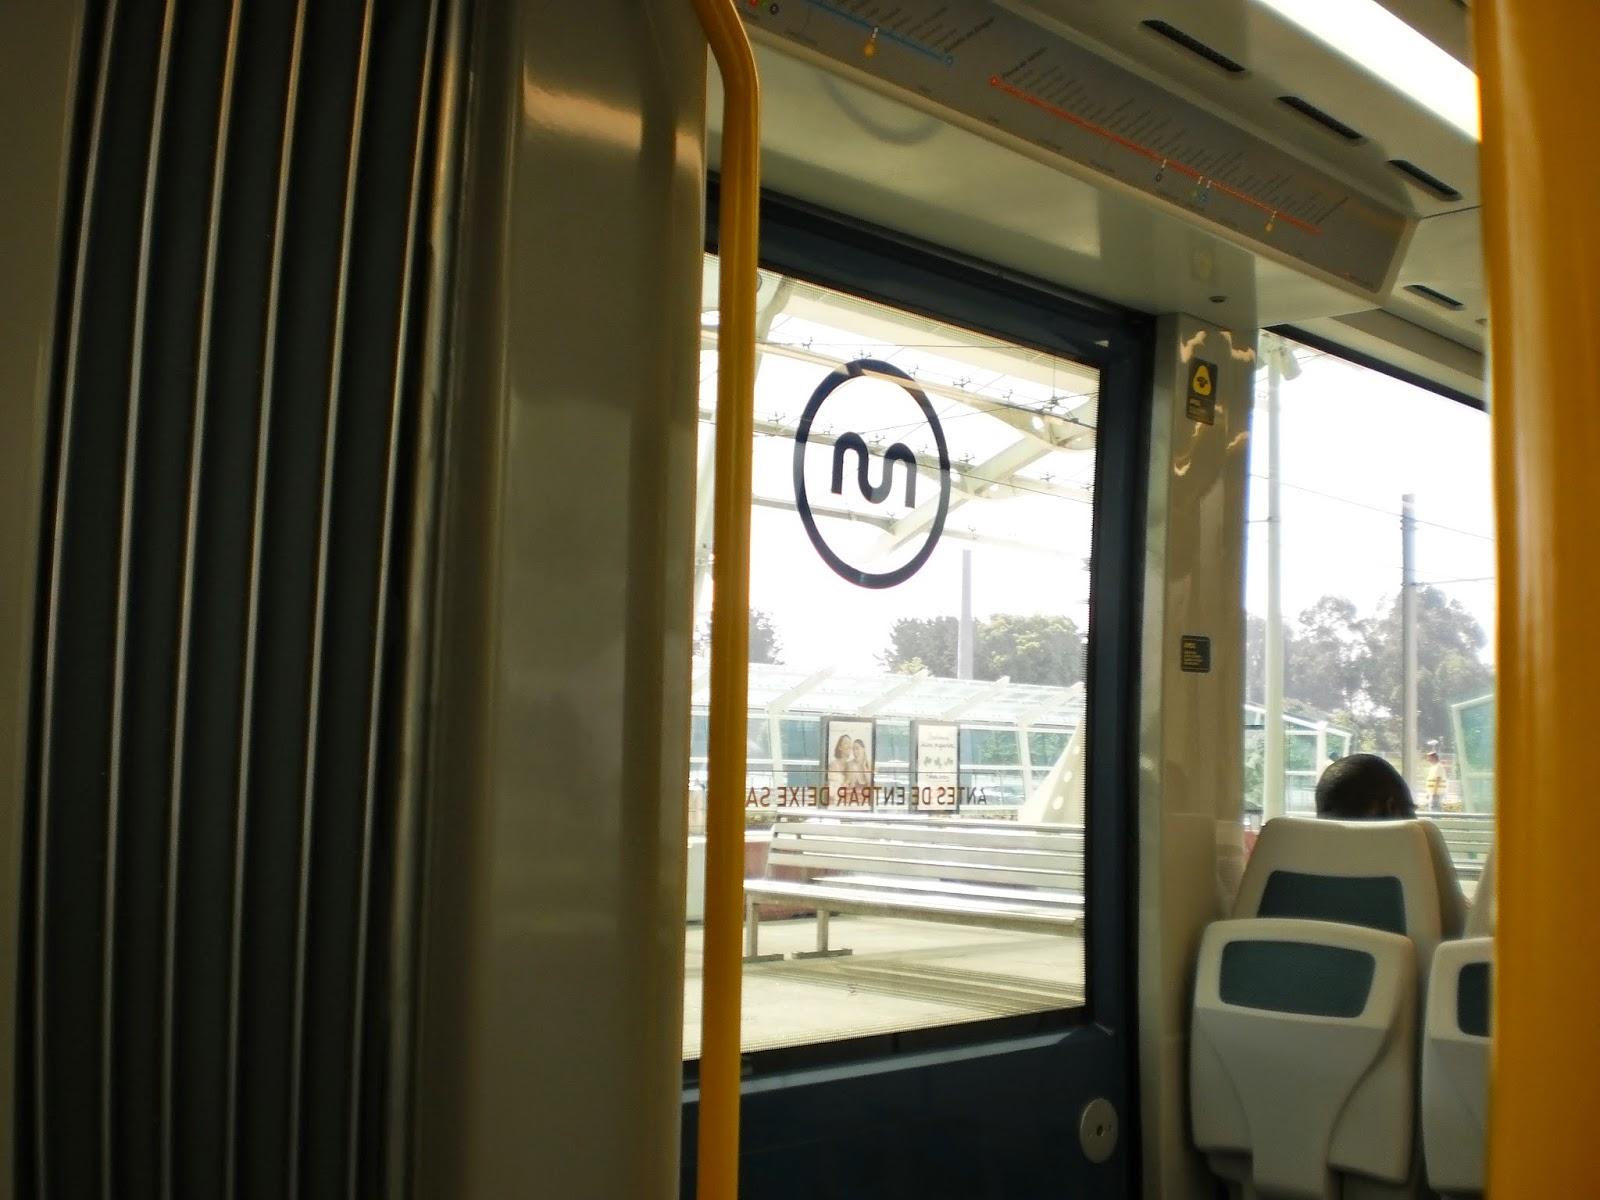 Porto (Portugal) metro